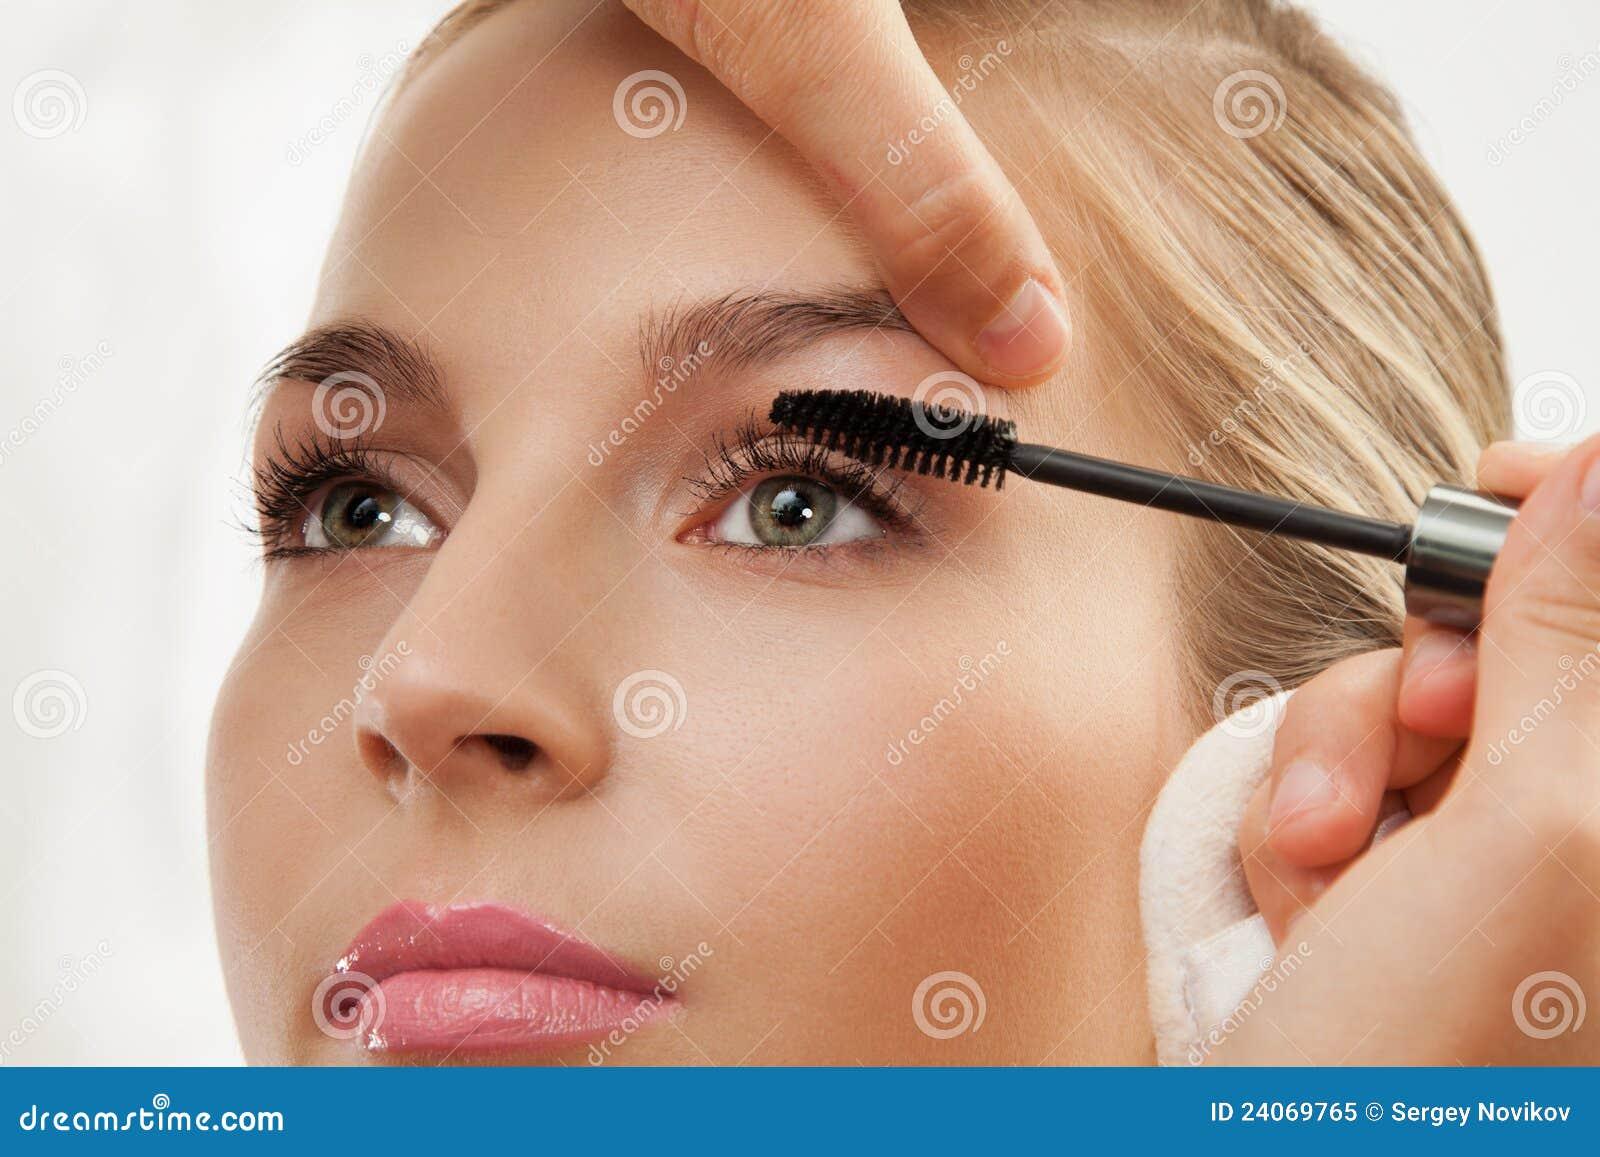 С чего начат макияж фото